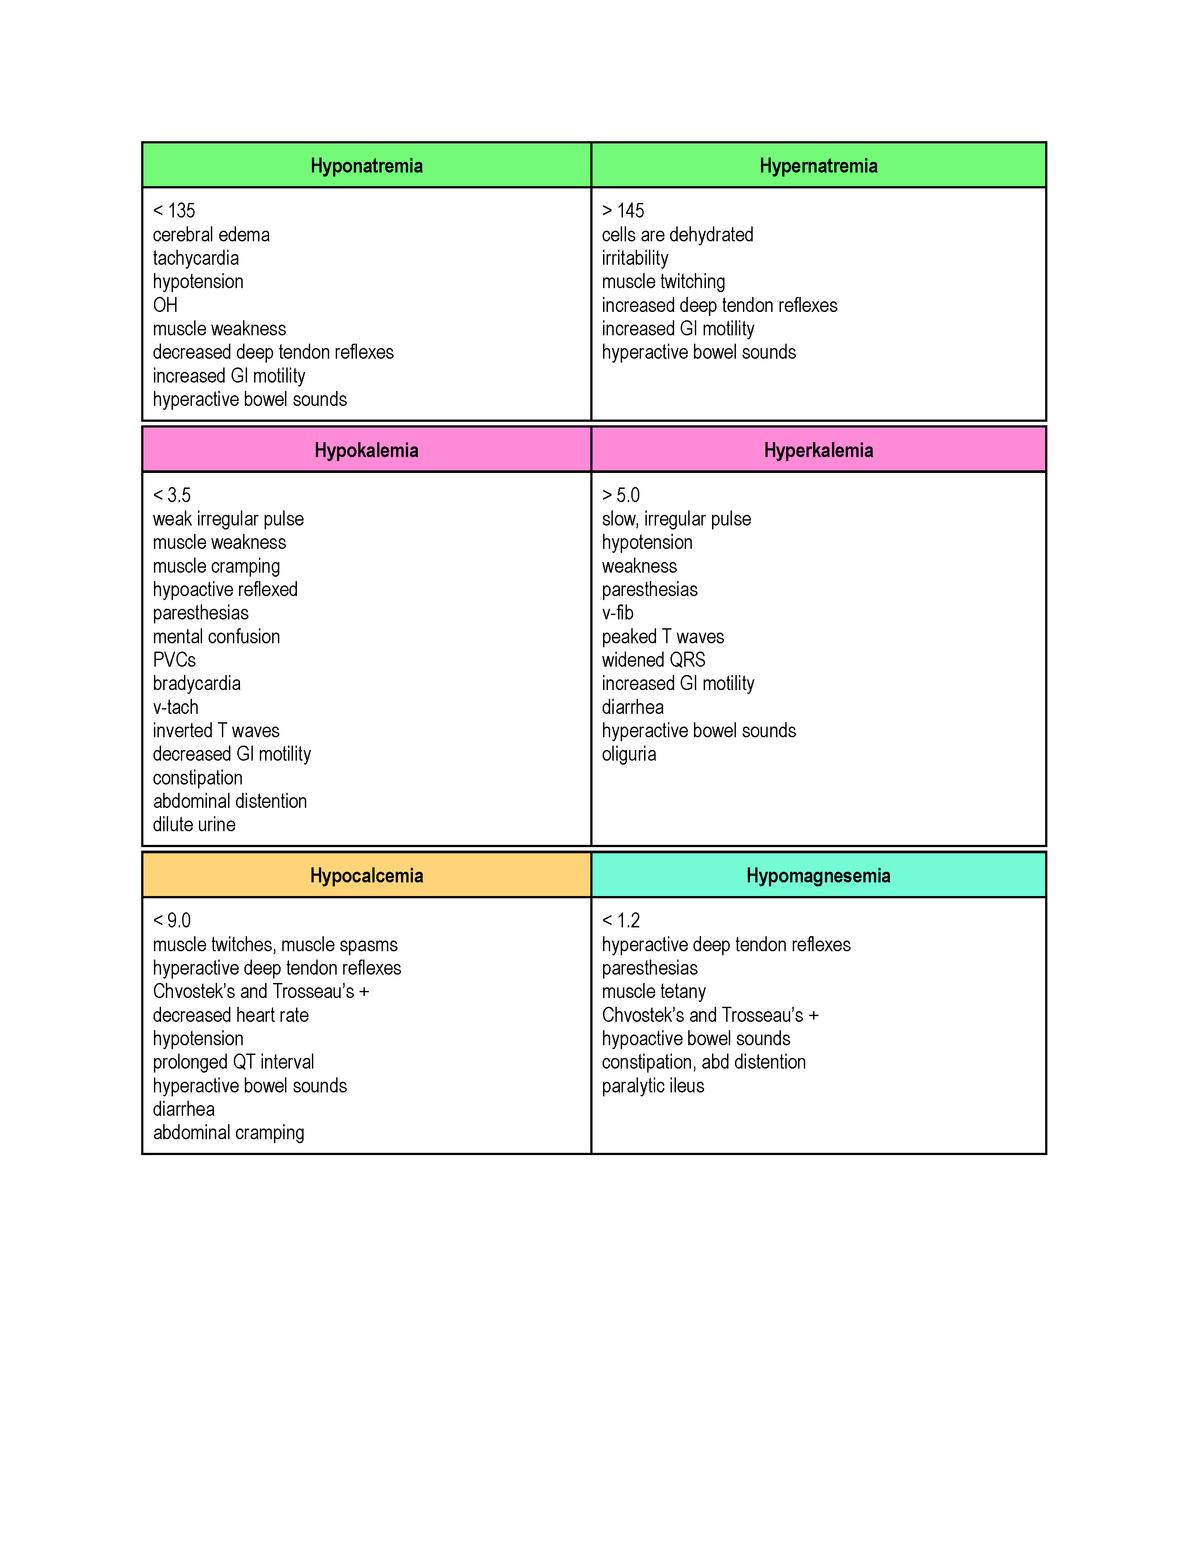 Electrolyte-imbalances-table - NUR330 - StuDocu